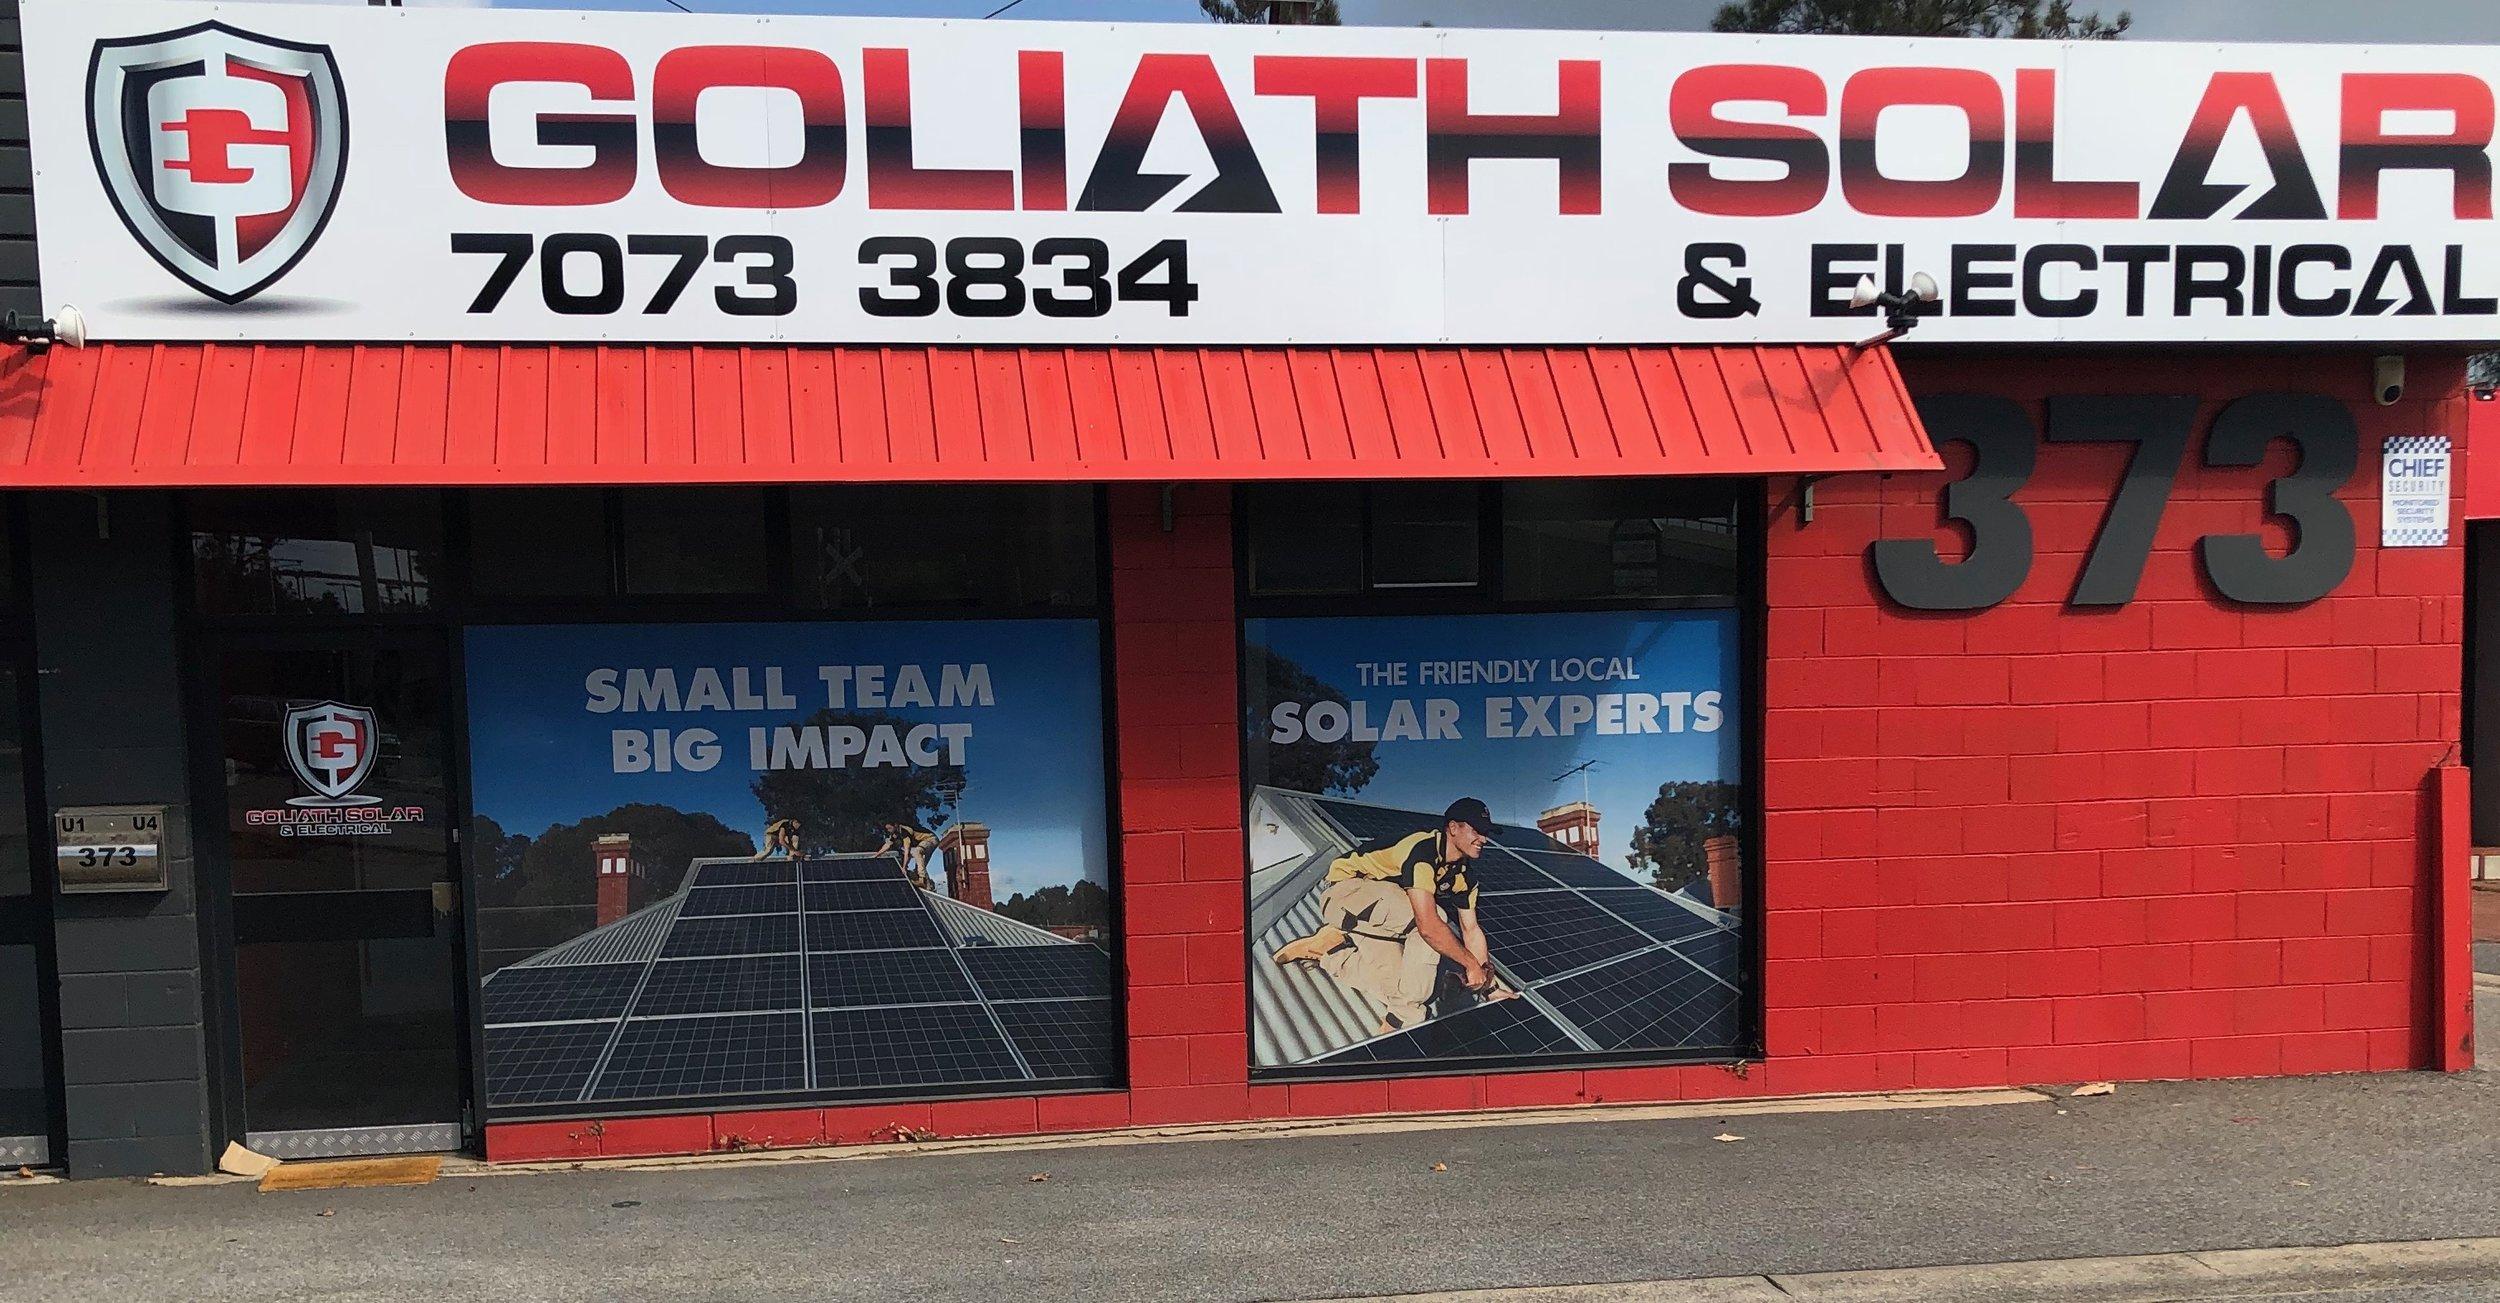 Goliath Solar & Electrical, Our Head Office : U4/373 Cross Road, Edwardstown SA 5039